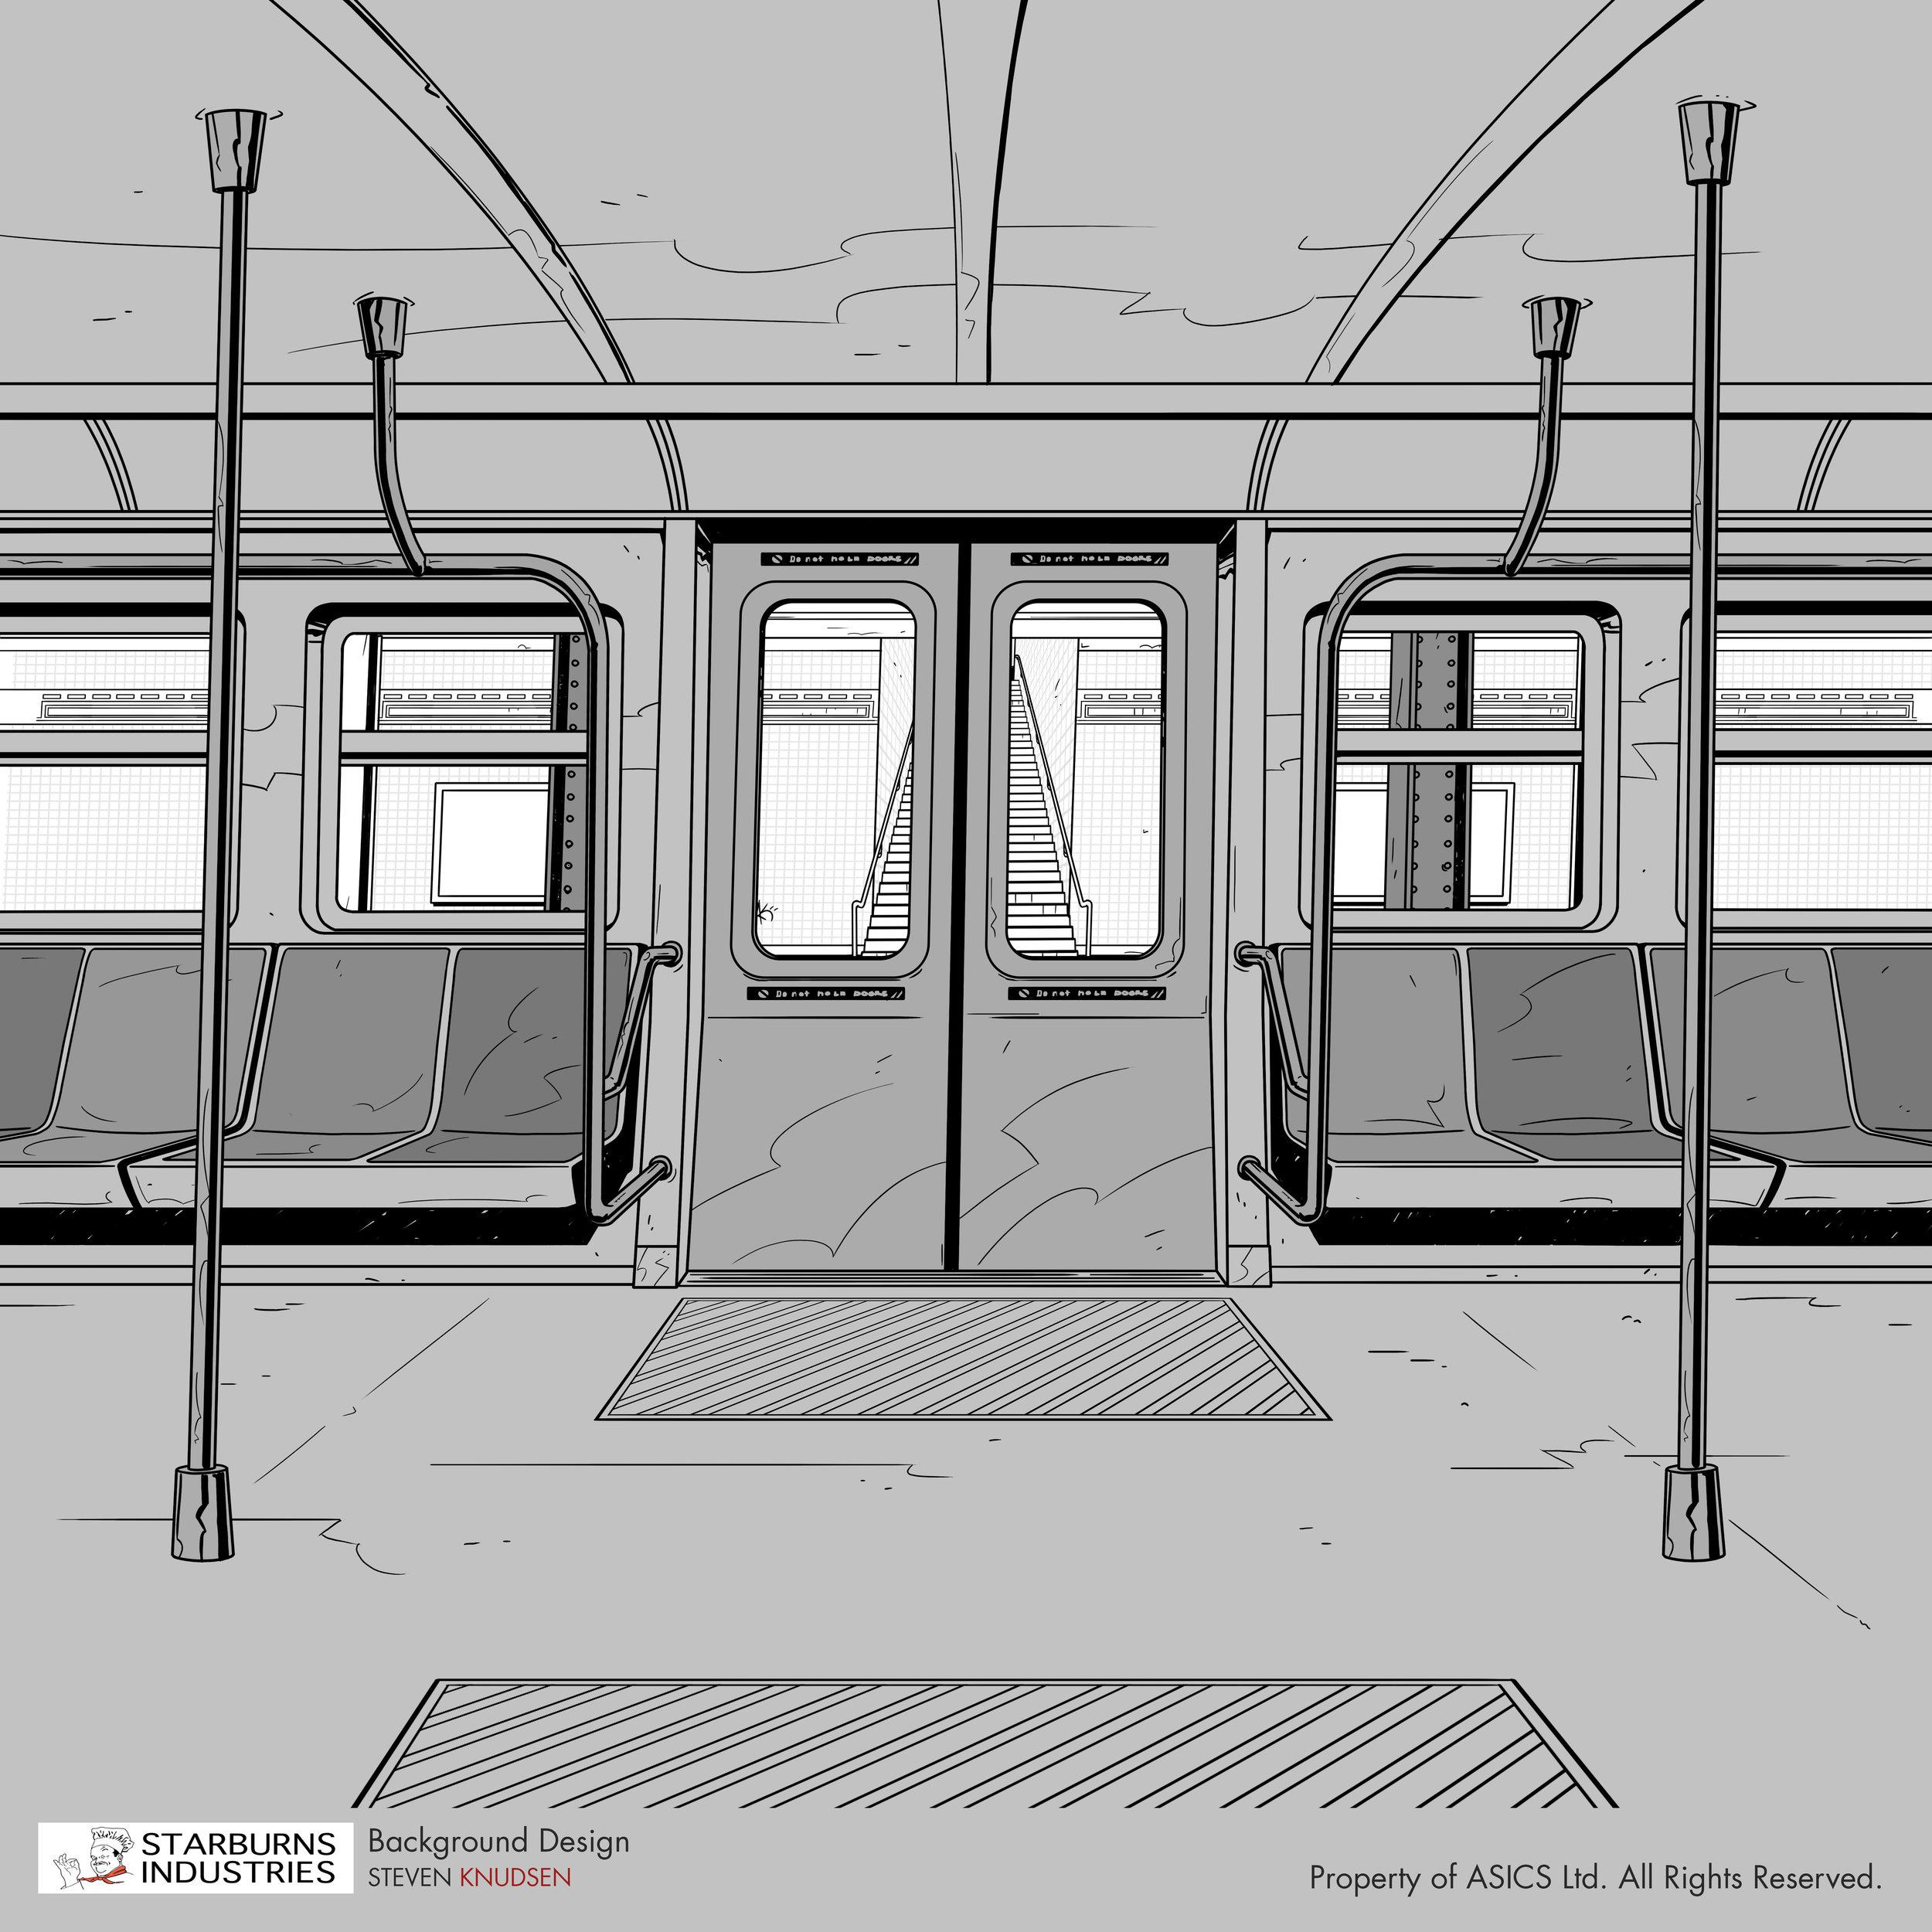 LNA_EP1_A009_TRAINSUBWAY_SK_v02.jpg